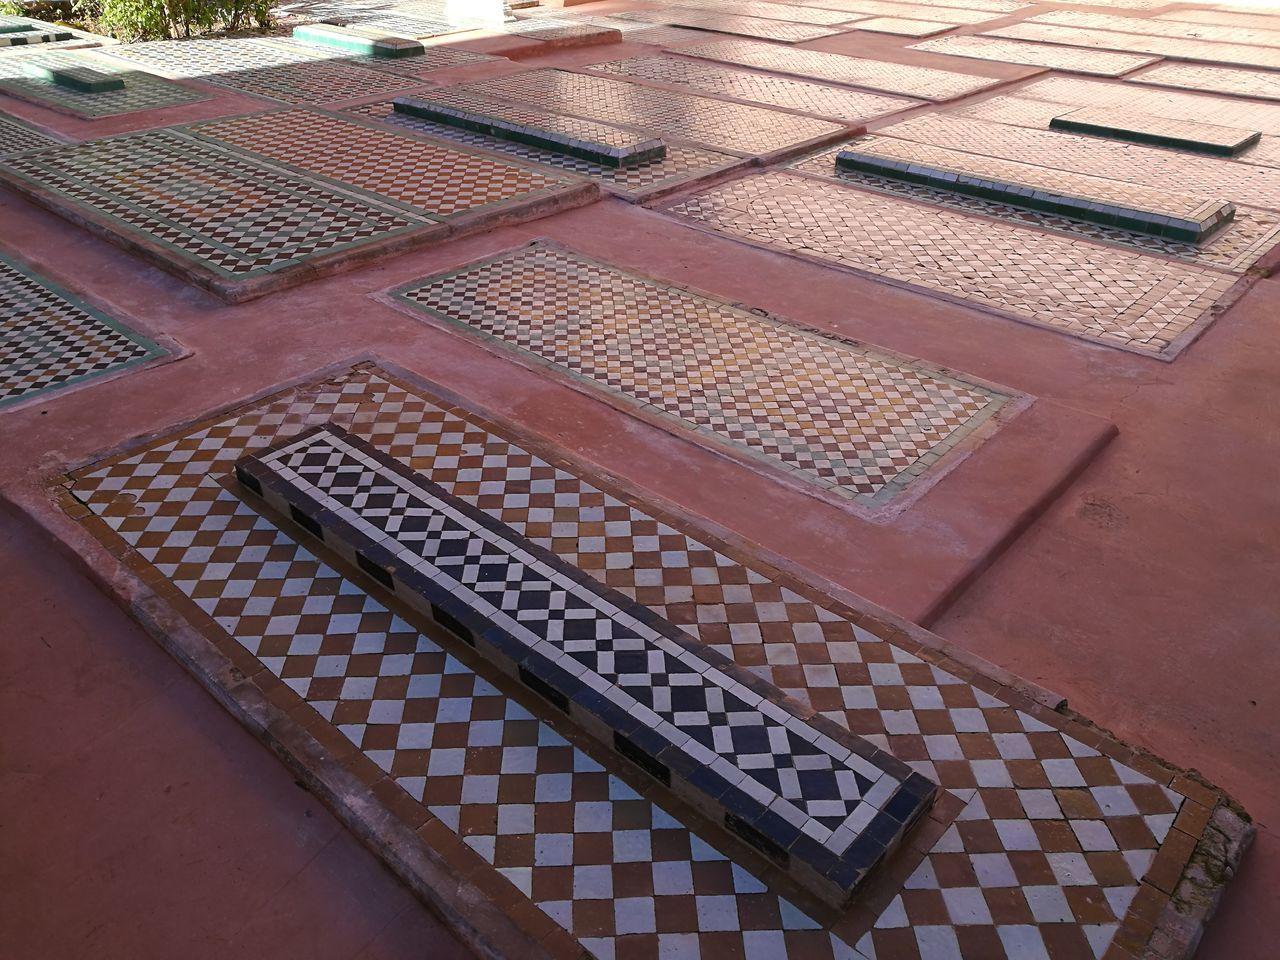 mausoleum Saadian Tombs Marrakesh Architecture Graveyard Marocco Mausoleum Mosaic Saadian Tombs Tombs Tourist Attraction  Travel Destinations